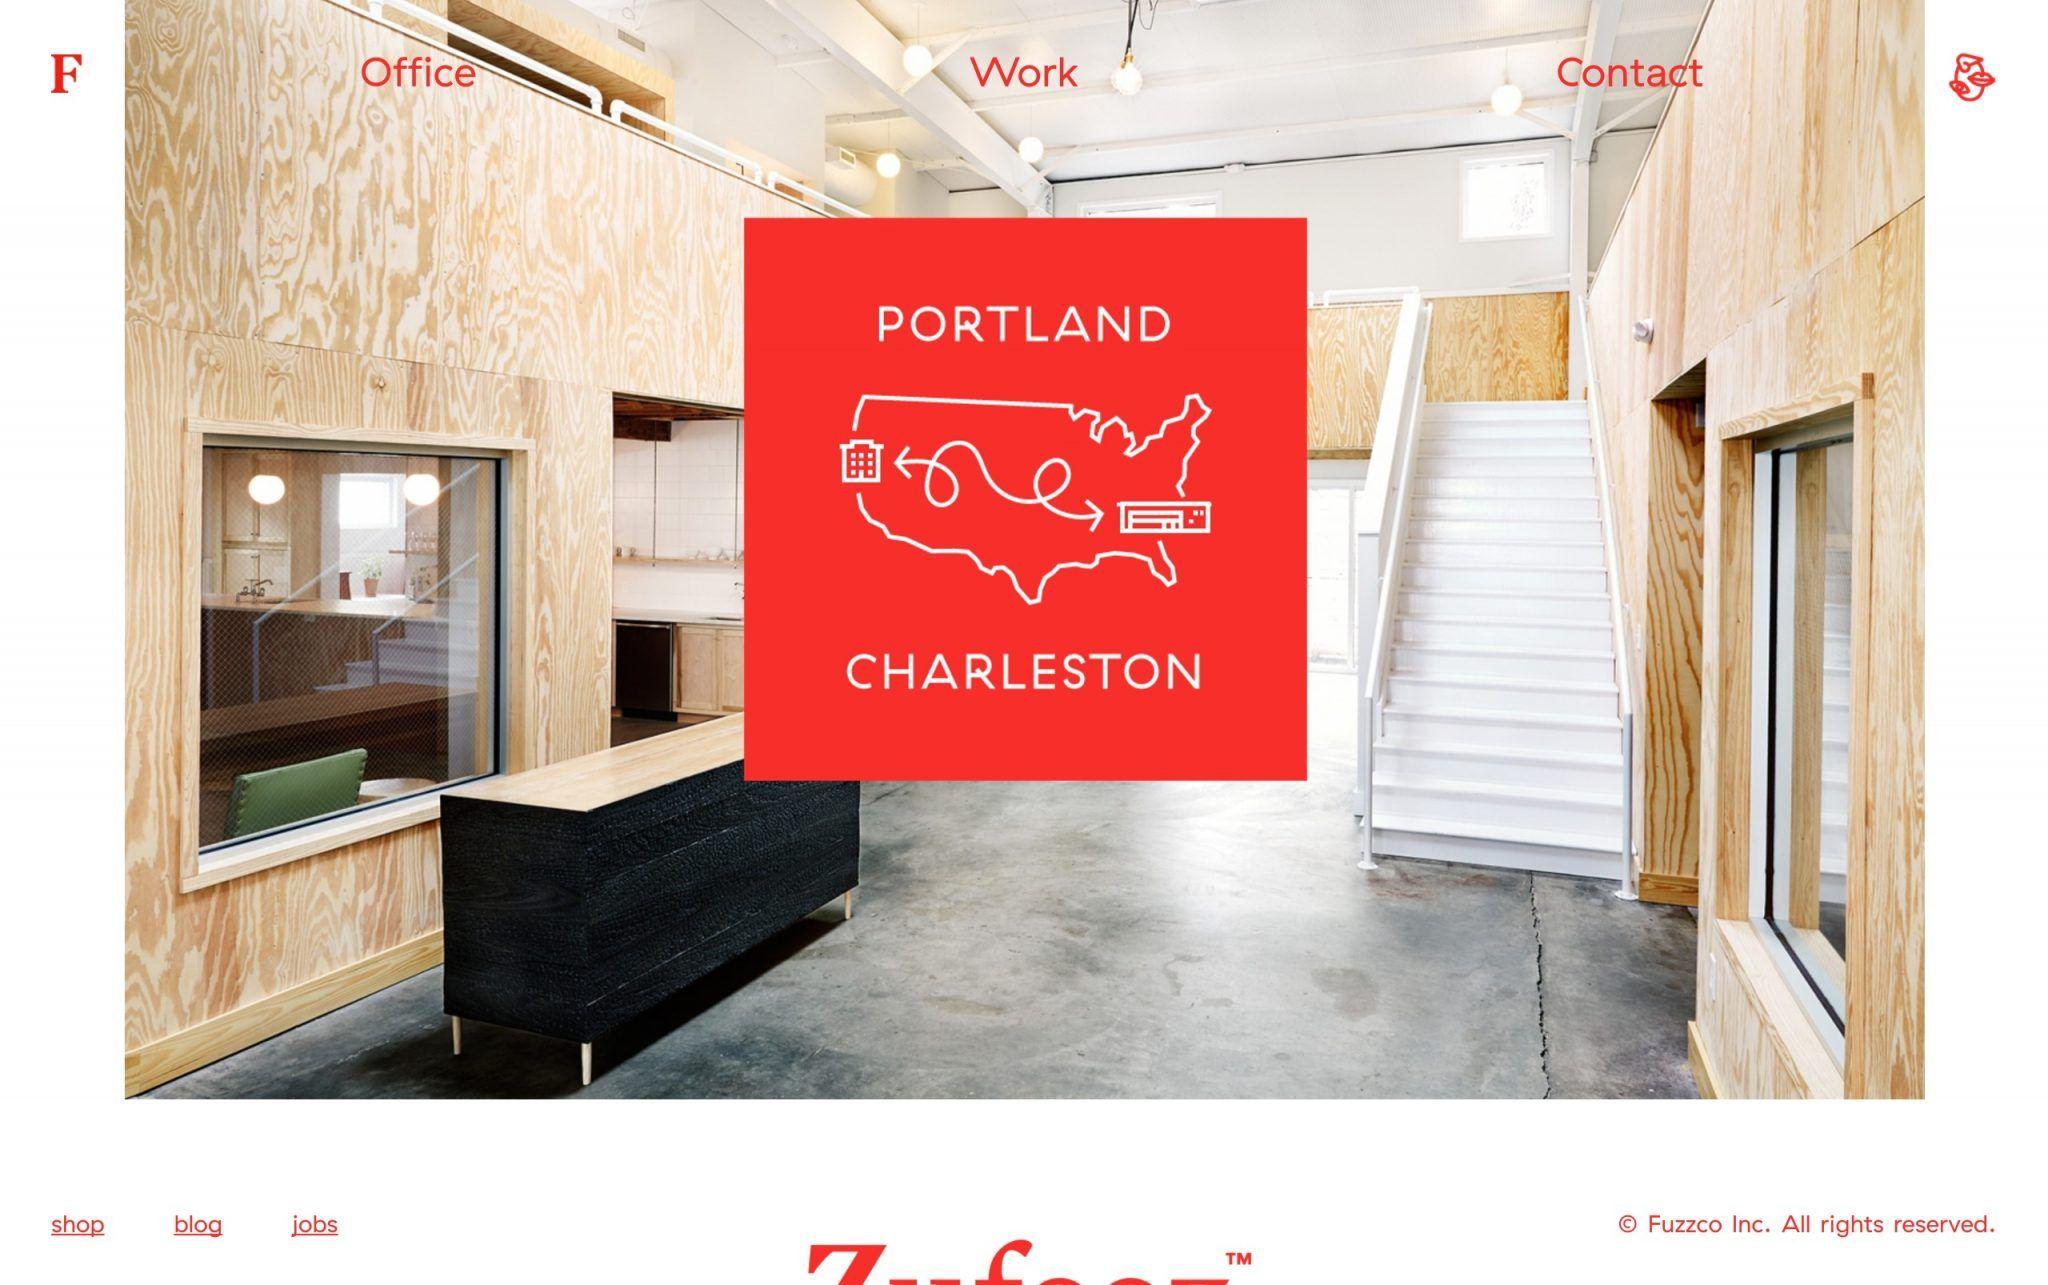 Fuzzco-Fuzzco-is-a-creative-agency-in-Charleston-and-Portland.swer_.jpeg (2048×1285)